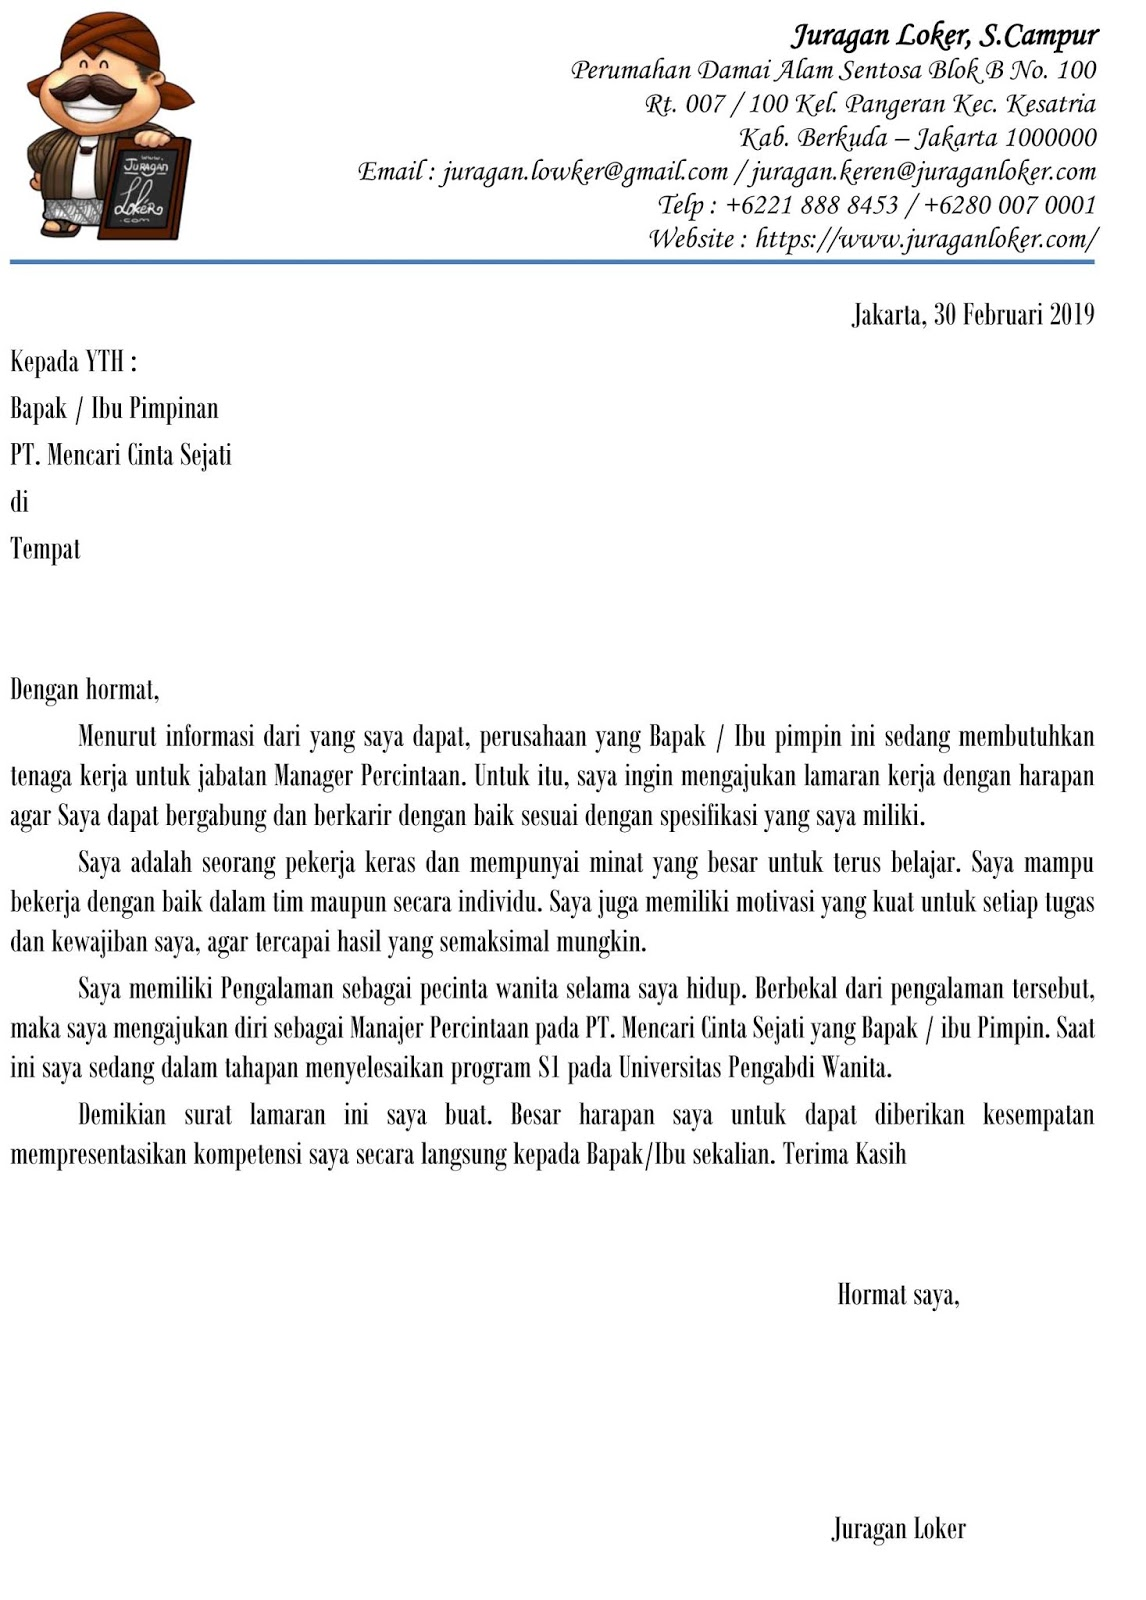 Contoh Surat Lamaran Kerja Di Pabrik Nabati Contoh Surat Lamaran Kerja